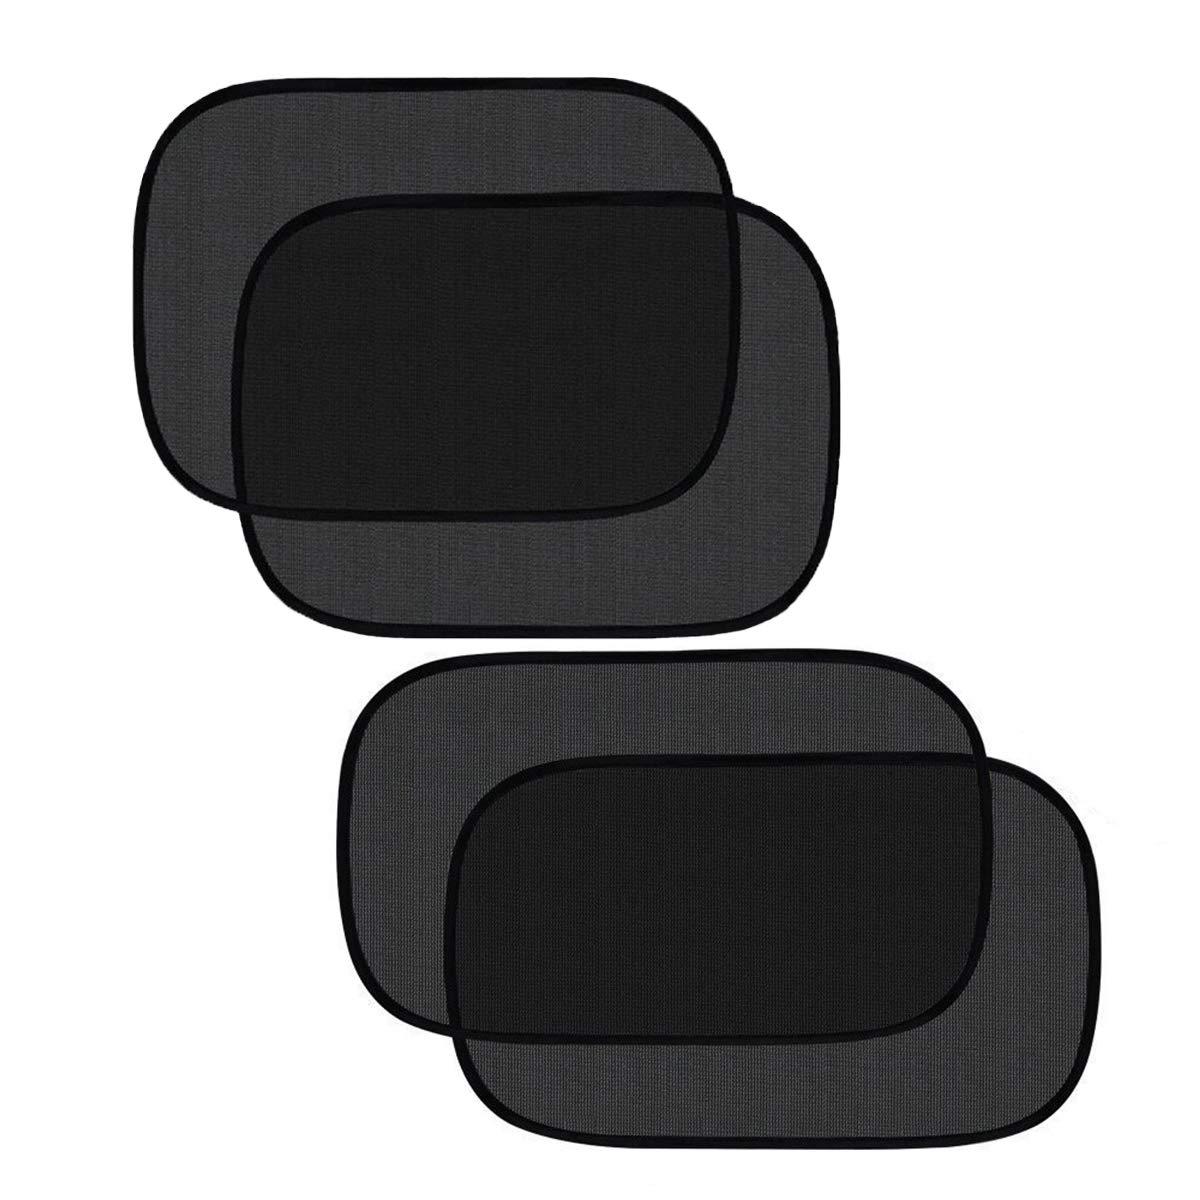 Pulaisen Car Window Shade - Sunshade for Car Side Window Clings - 80GSM UPF50+ Blocks Over 99% of Harmful UV Rays - Baby Side Window Car Sun Shades 20''x 12'' and 19''x 14'' (20''x12''&19''x14'')